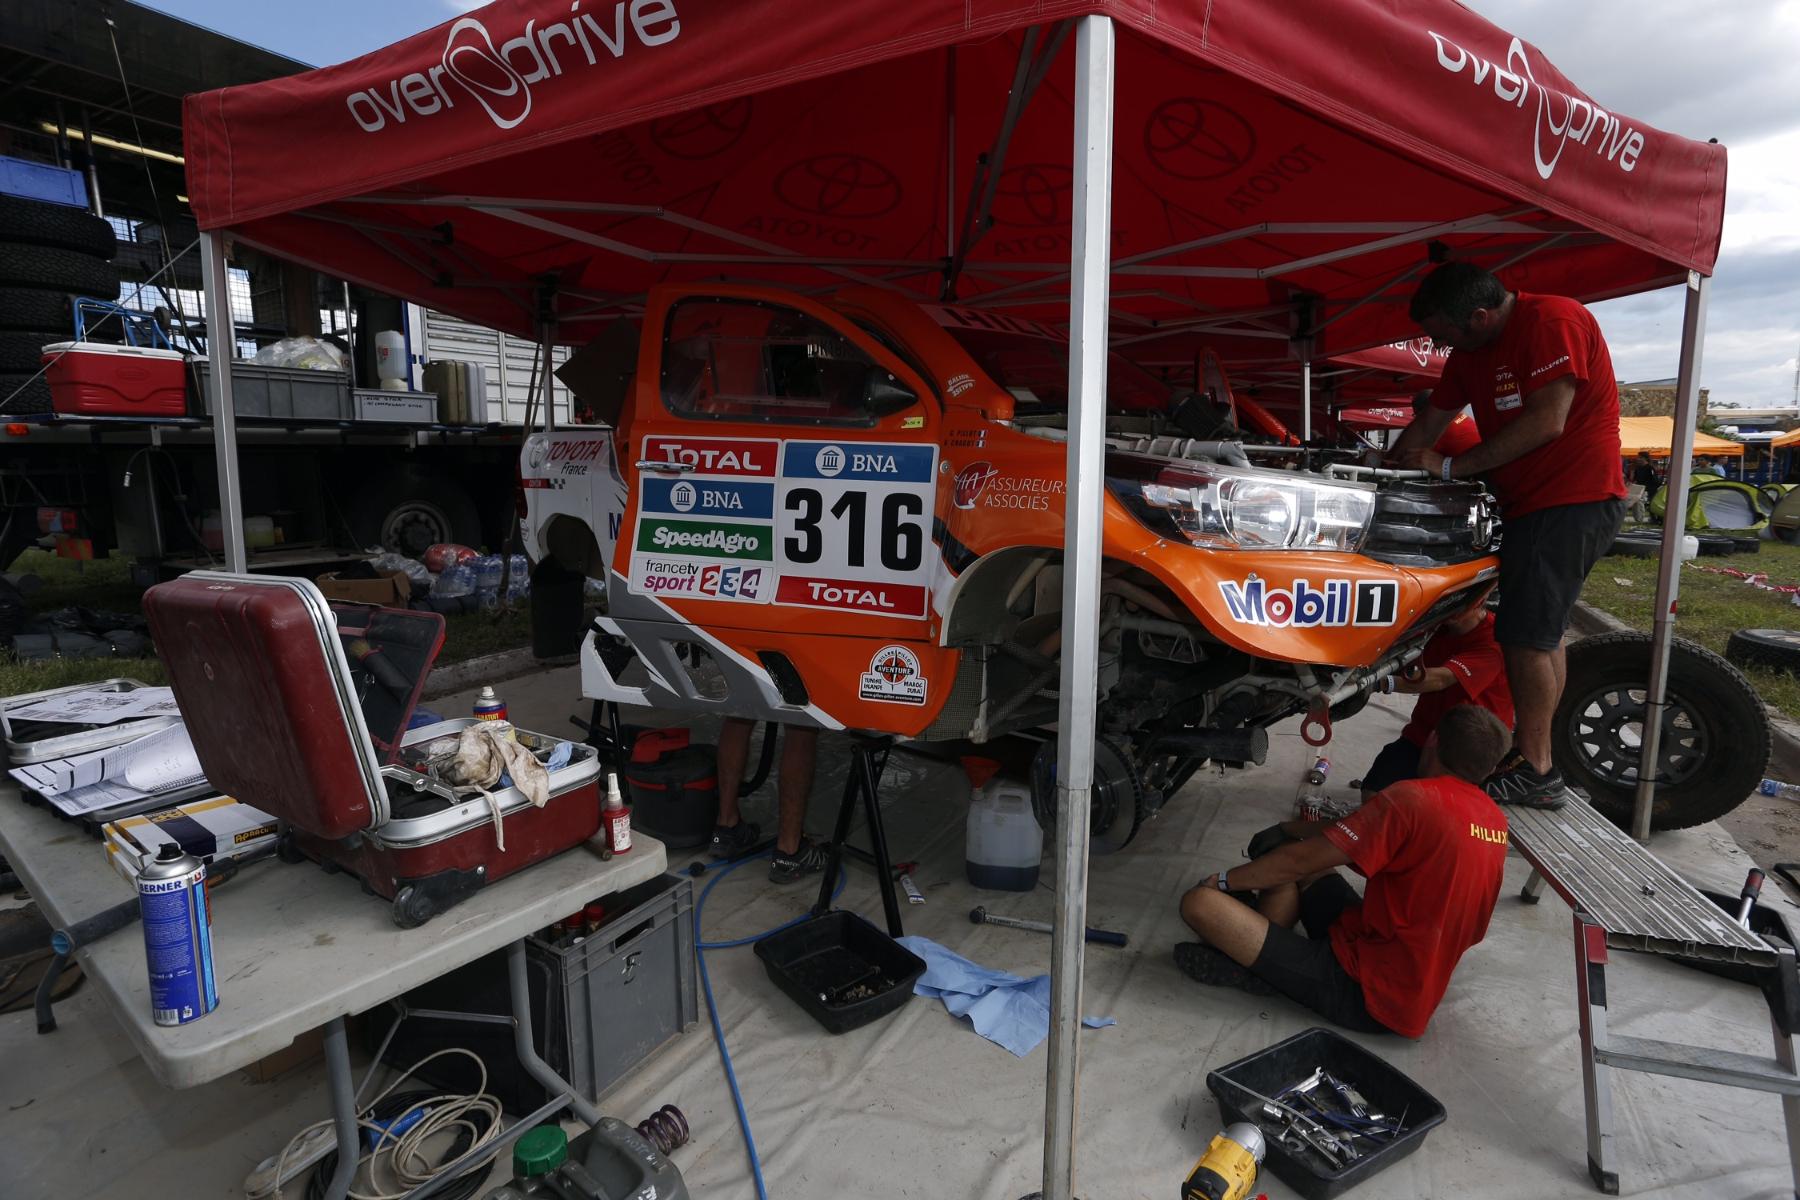 316 CHABOT Ronan (fra) PILLOT Gilles (fra) TOYOTA ambiance during the Dakar 2016 Argentina,  Bolivia, Etape 8 / Stage 8, Salta - Belen,  from  January 11, 2016 - Photo Florent Gooden / DPPI